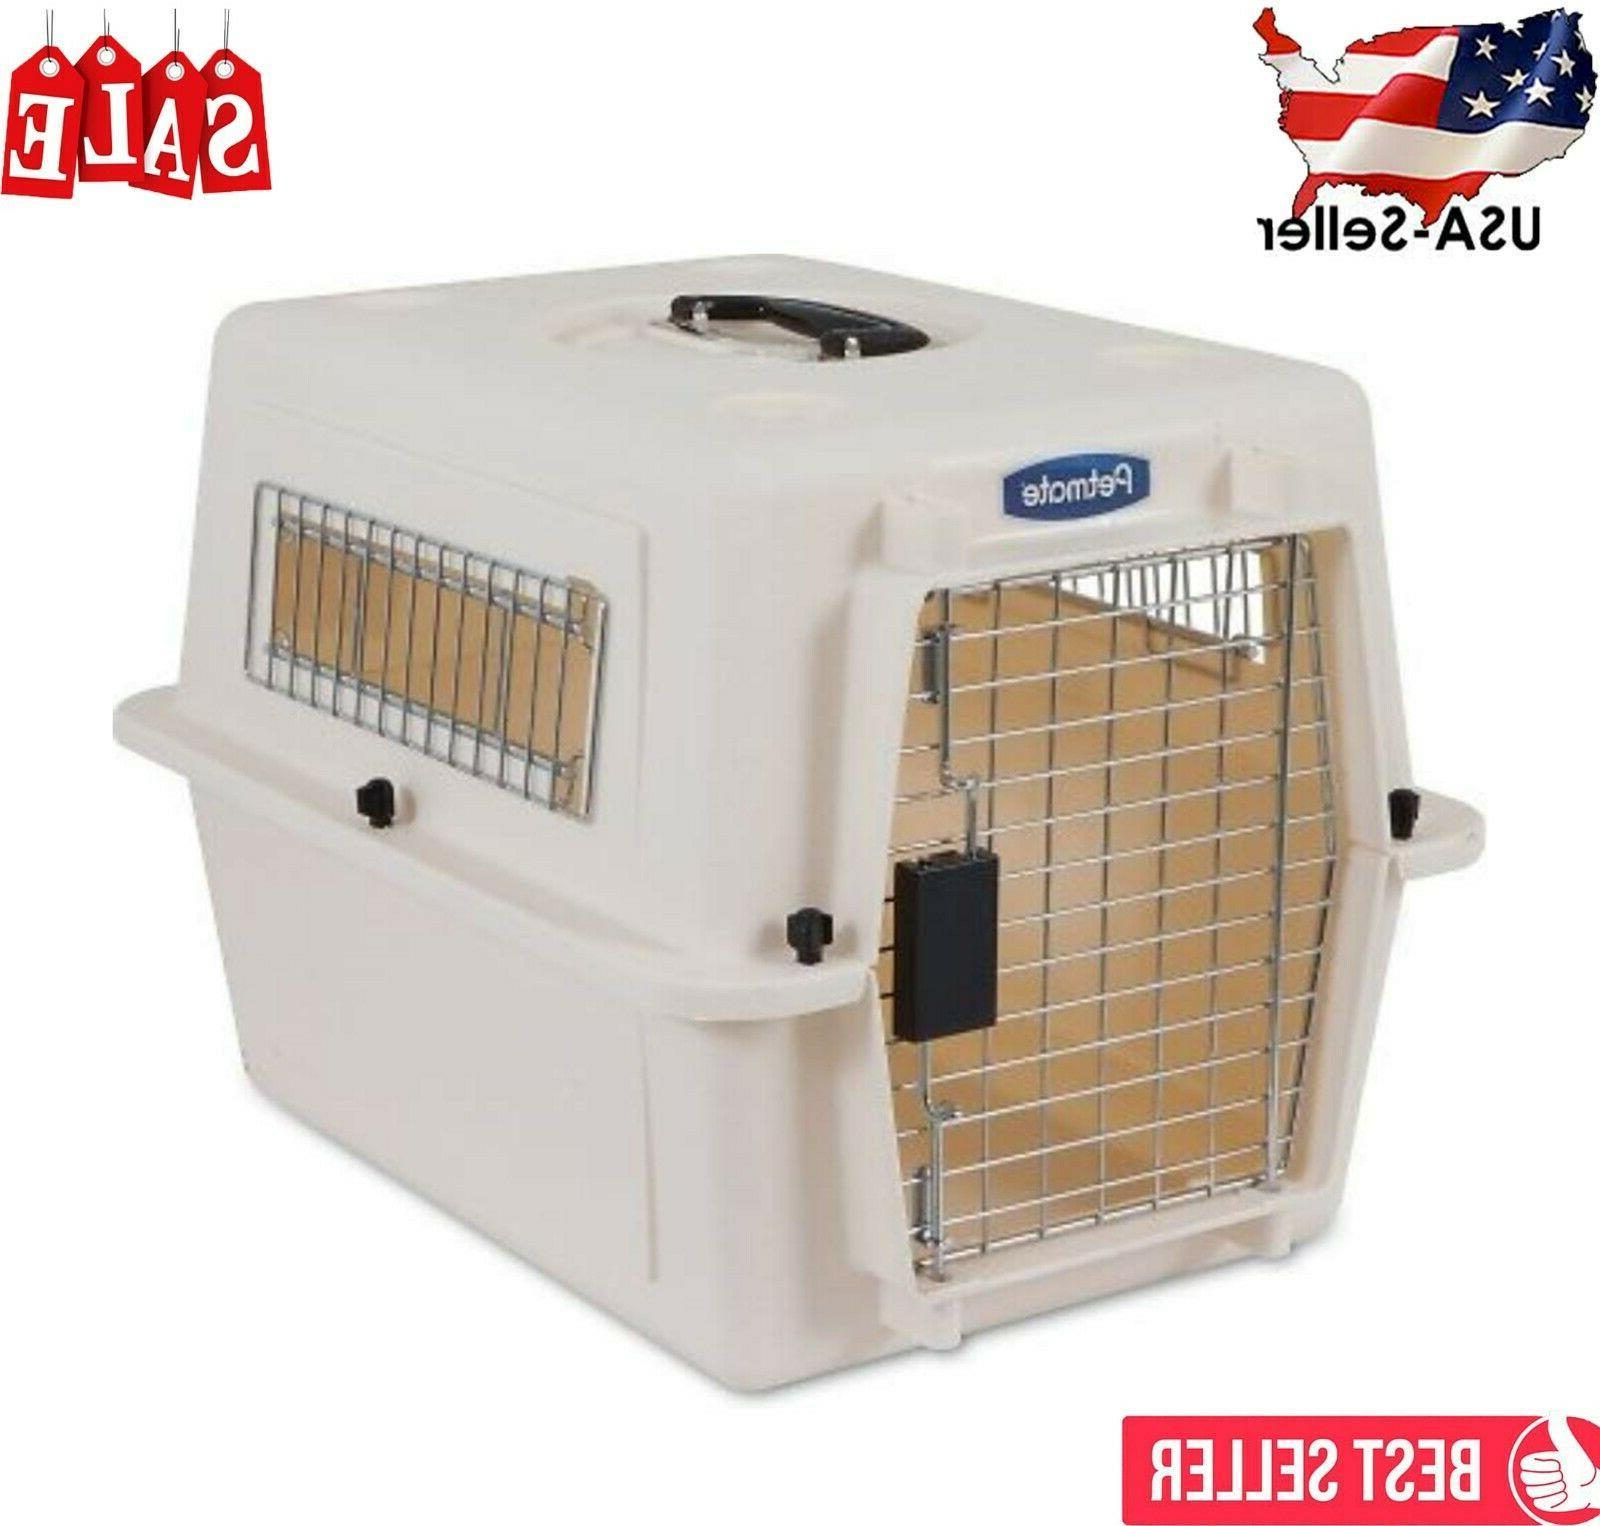 ultra vari kennel 40 for dogs